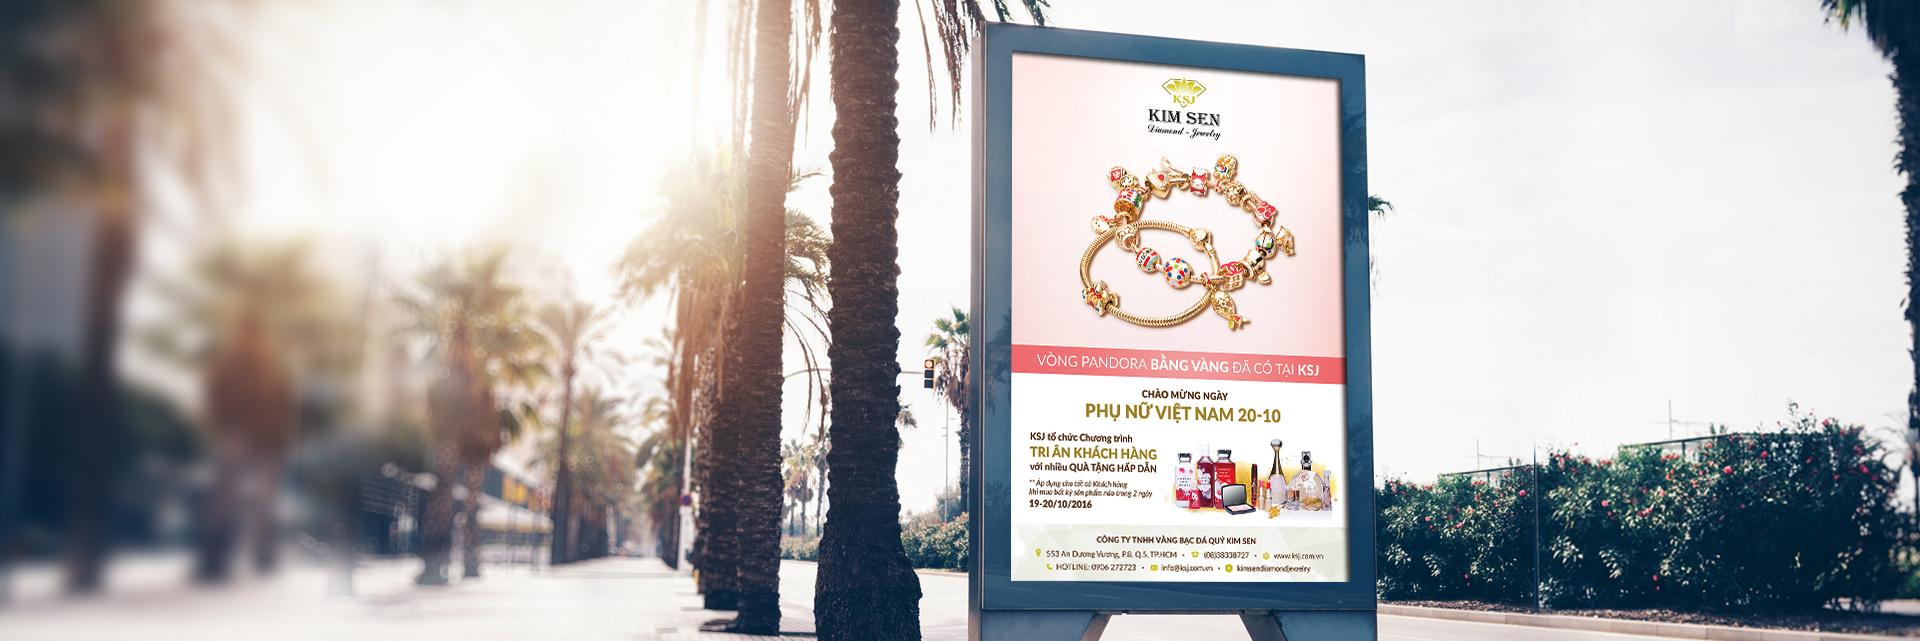 Kim-sen-jewelry-slide-1